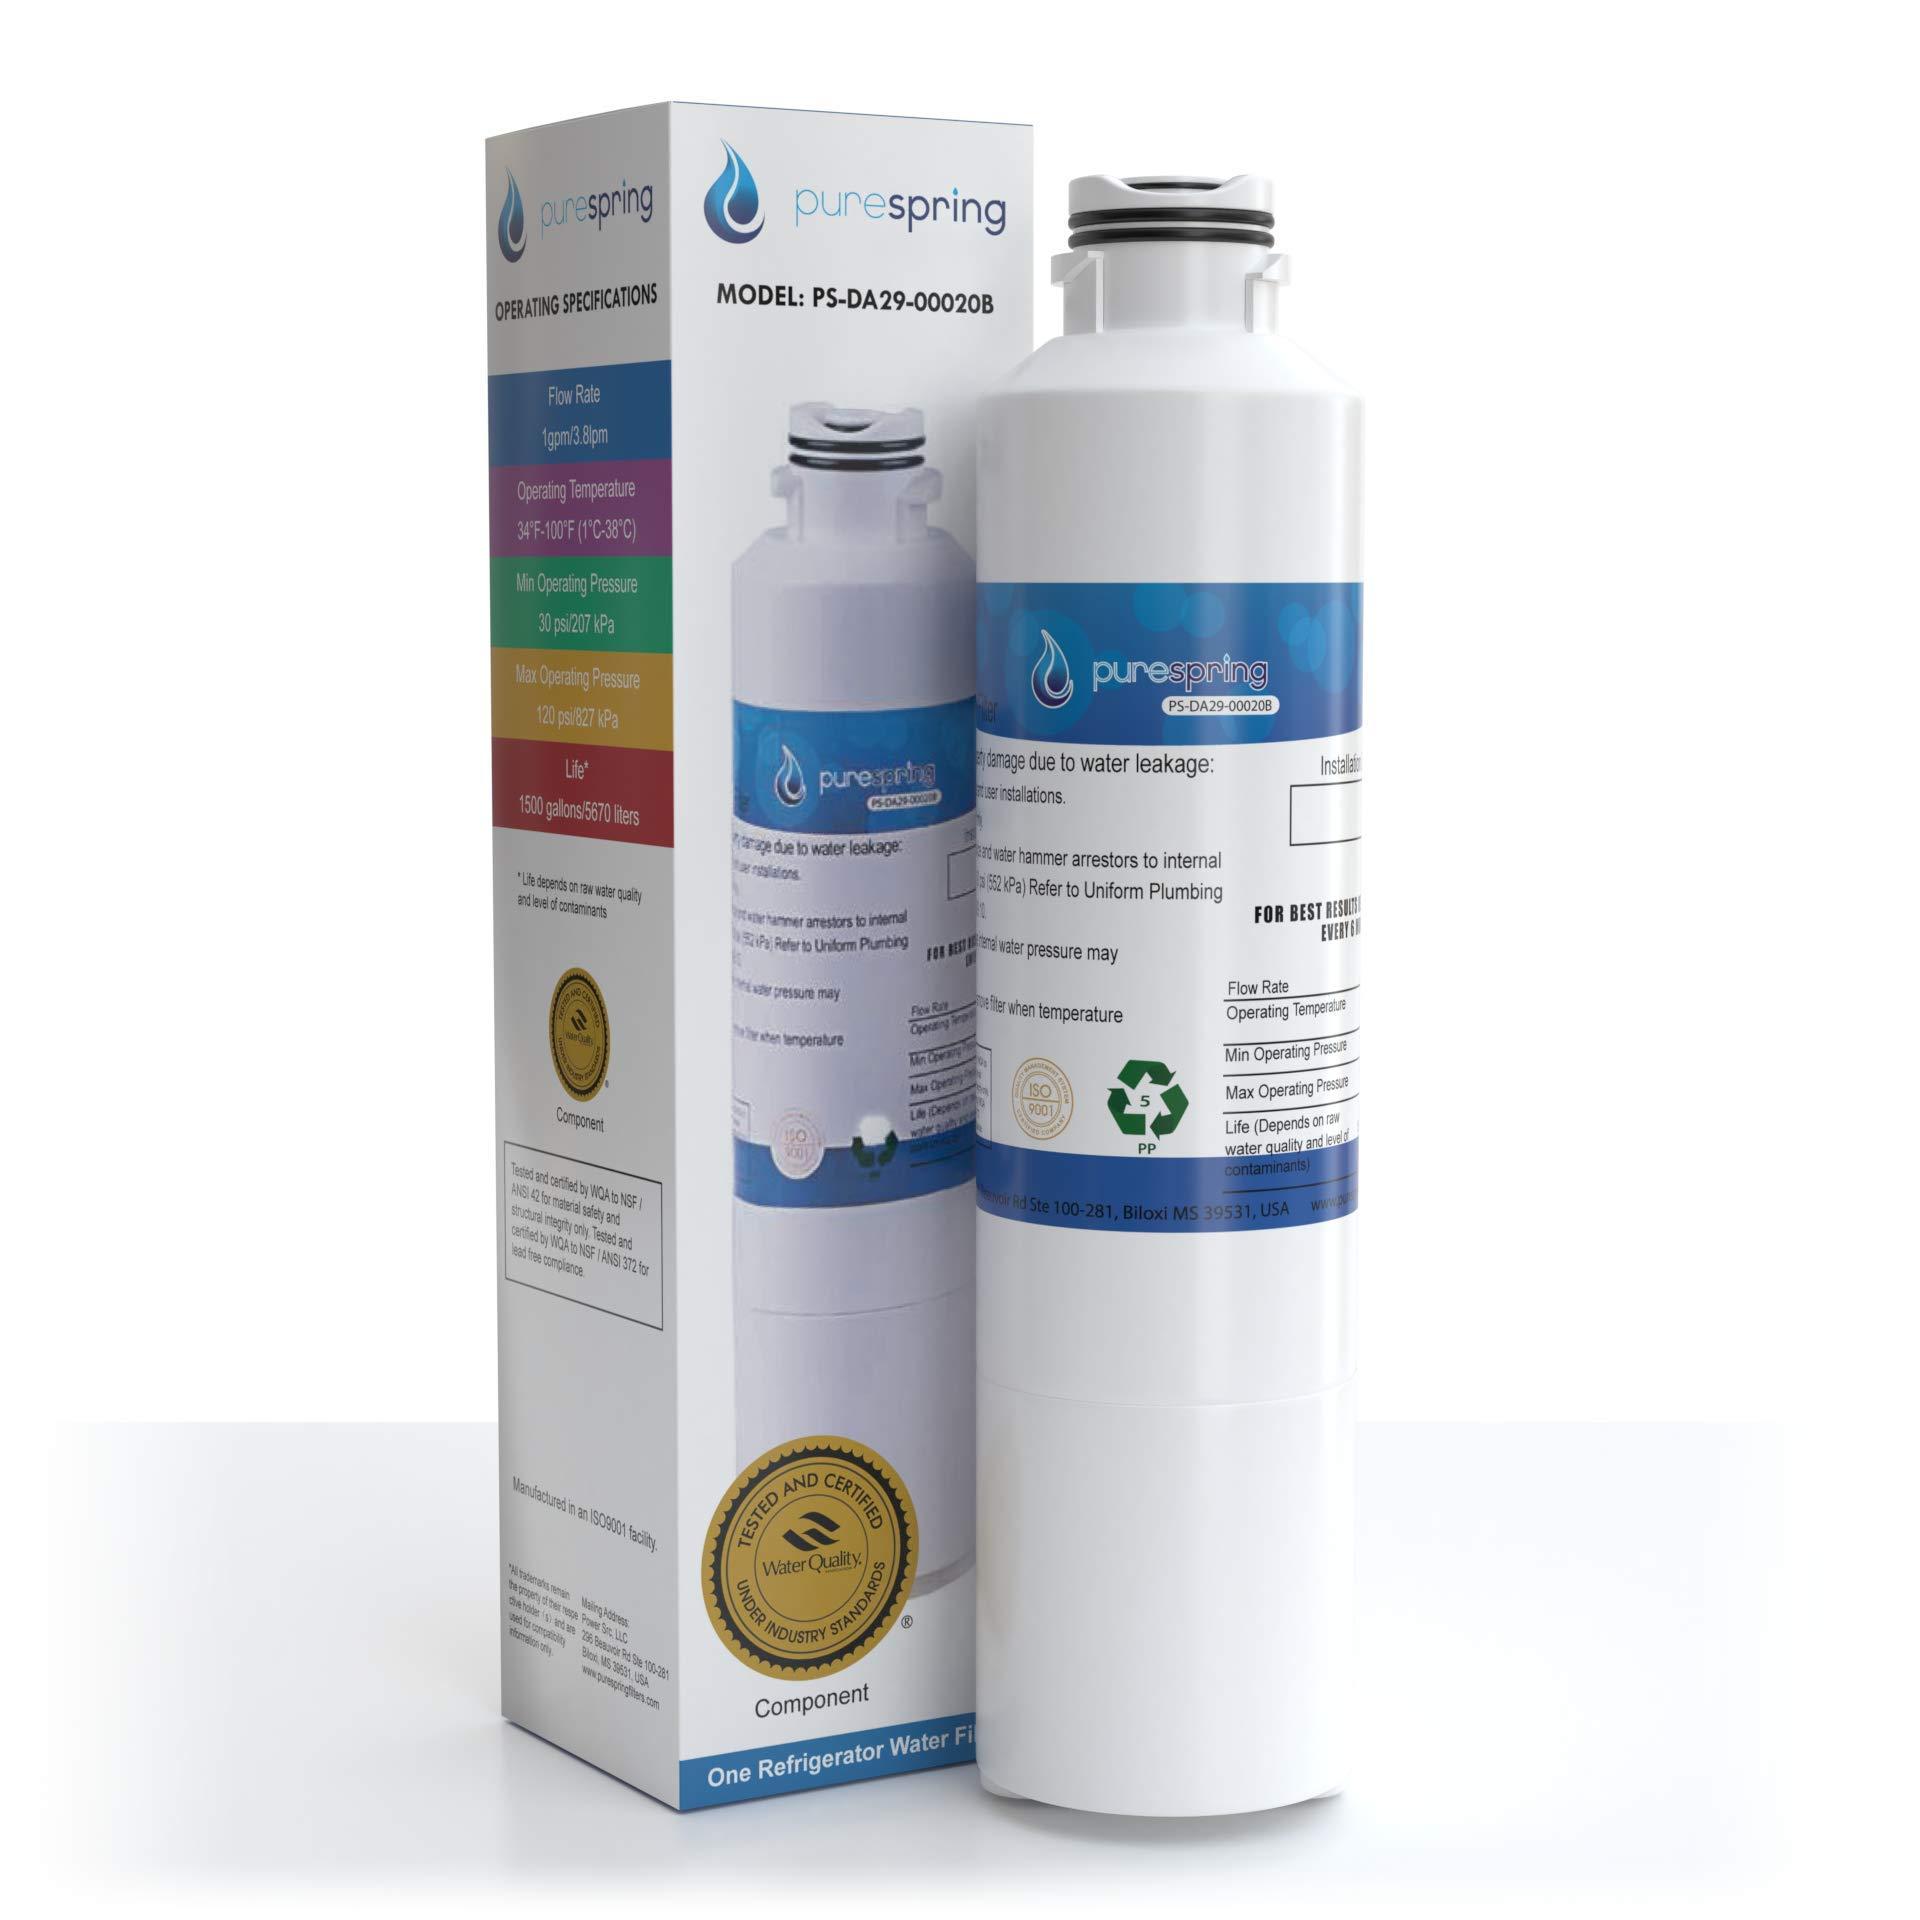 PureSpring Samsung-DA29-00020B Refrigerator Water-Filter Compatible Cartridge - Replaces Samsung DA29-00020B, DA29-00020A, HAF-CIN/EXP, Kenmore 46-9101 (1 pack)